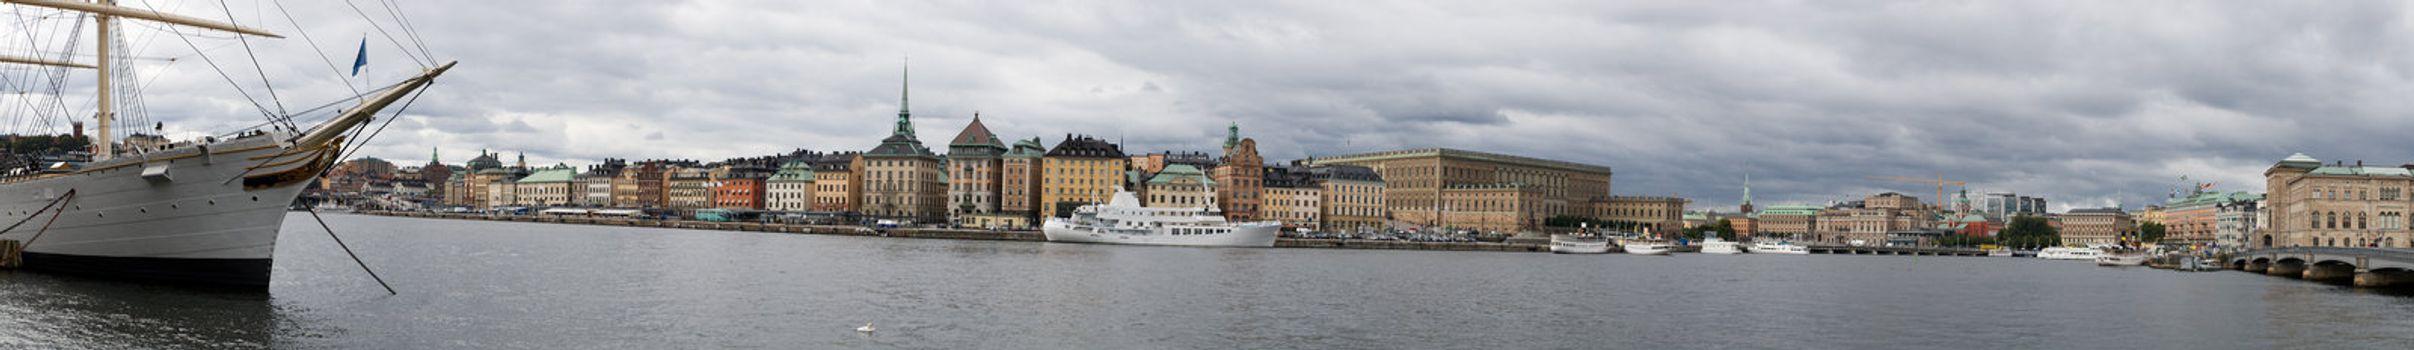 Panorama of Stockholm